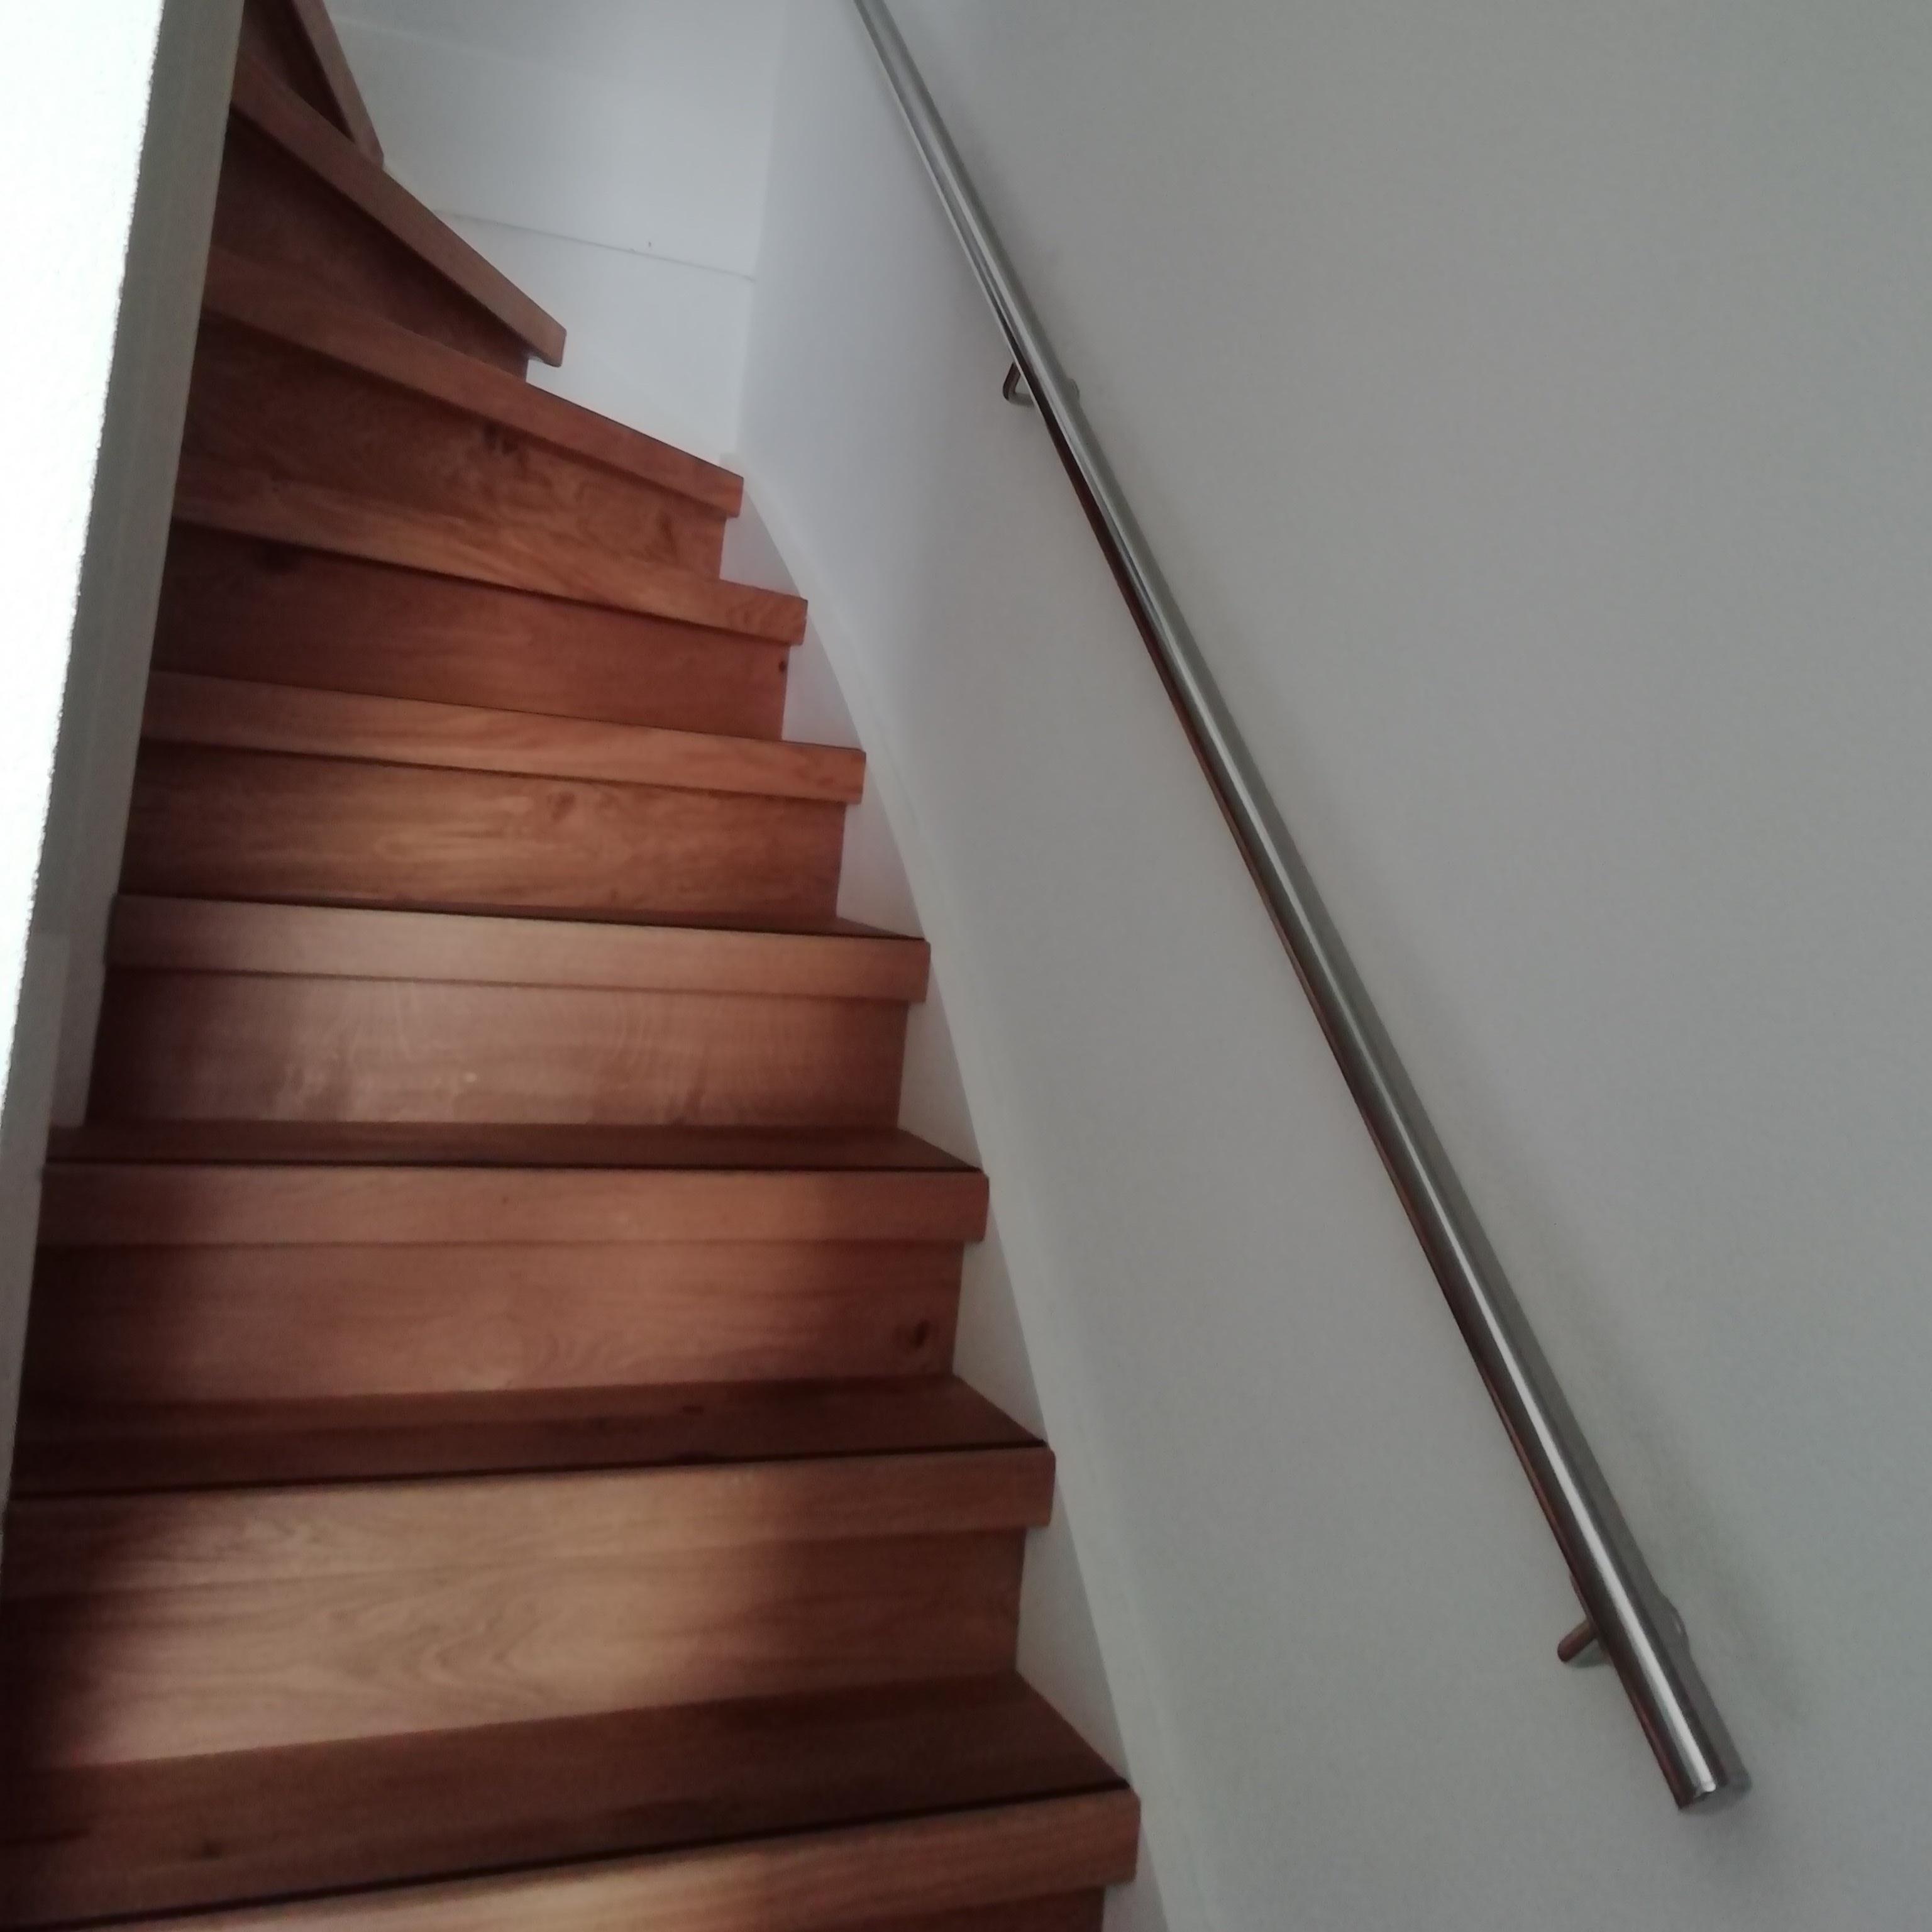 Handlauf Edelstahl rund poliert Modell 3 - Runde Edelstahl Treppengeländer - Treppenhandlauf